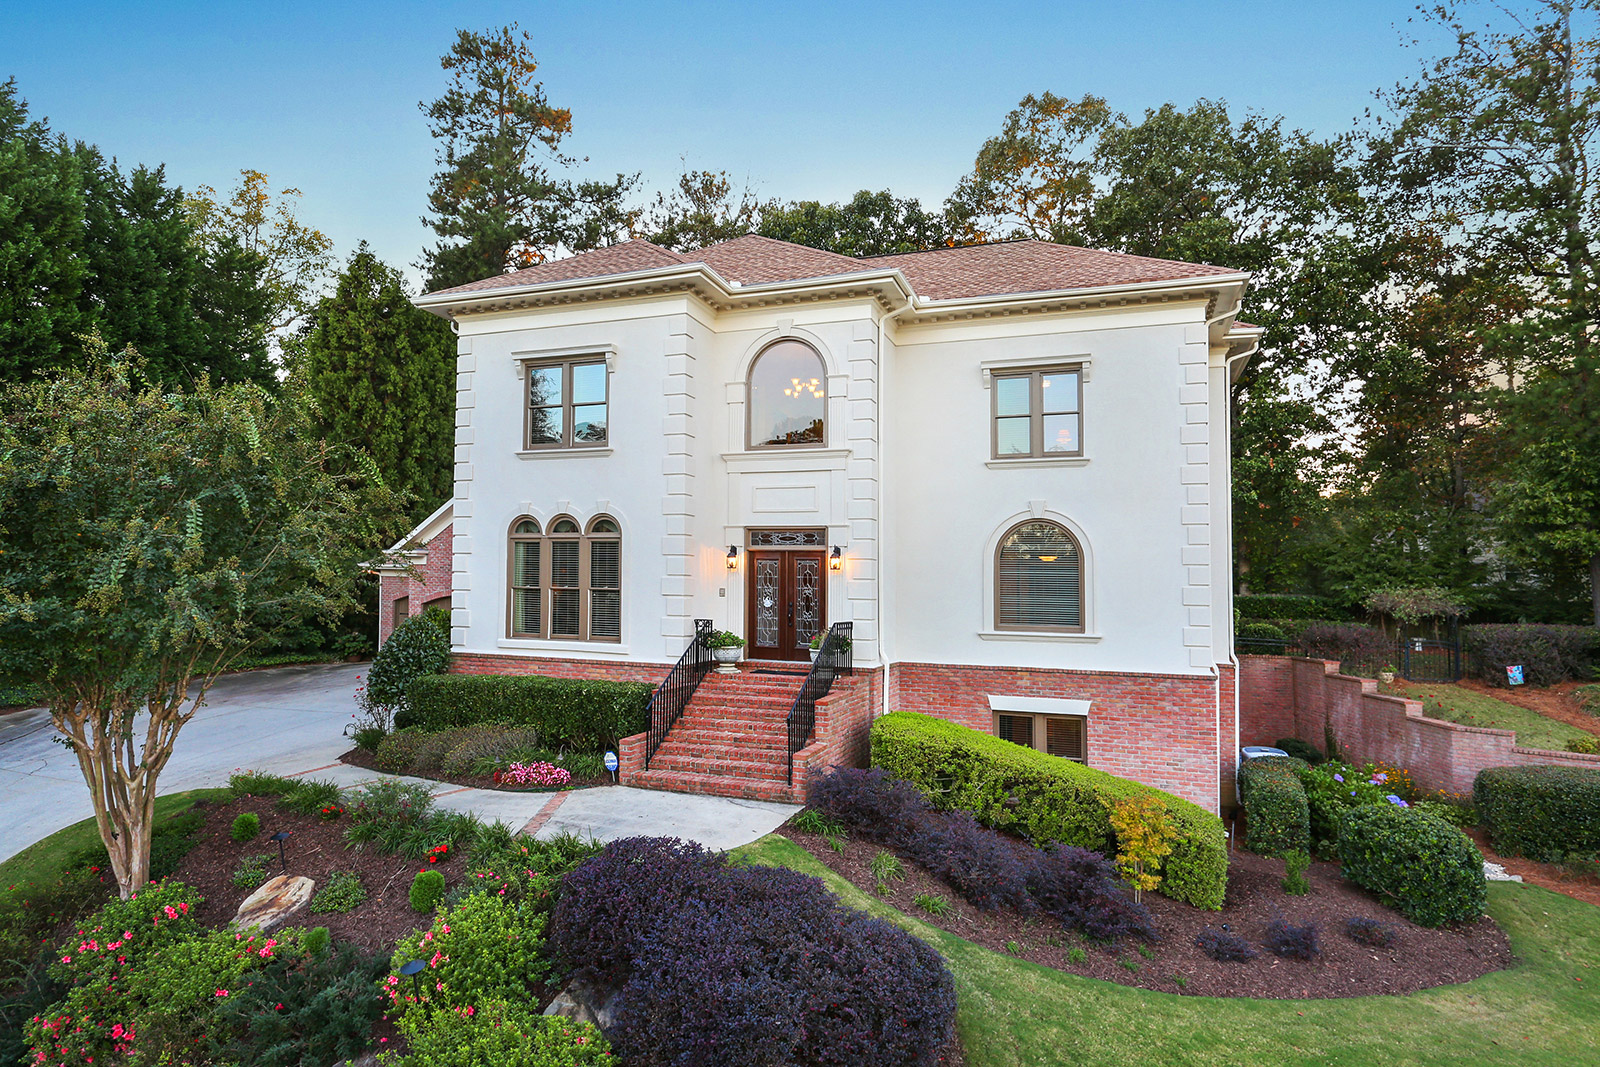 Maison unifamiliale pour l Vente à Beautiful Mediterranean Style with Master on Main 560 Kearny Street Alpharetta, Georgia 30022 États-Unis